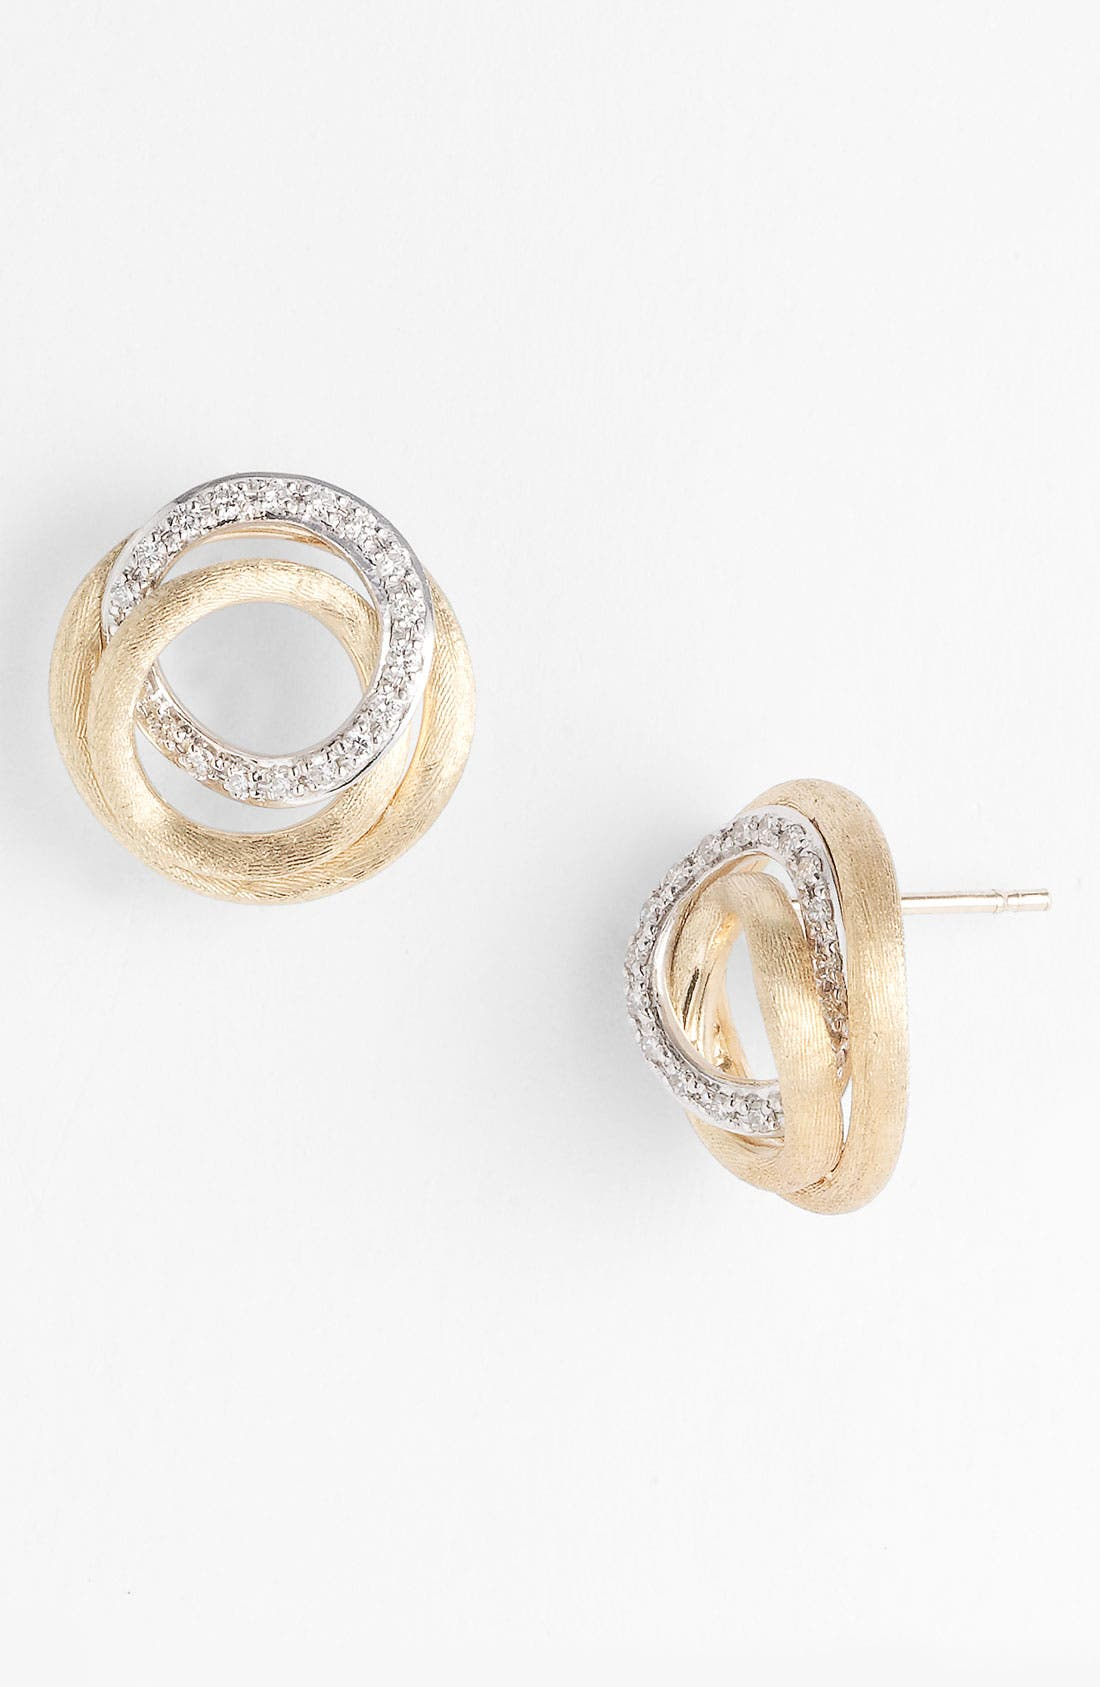 Main Image - Marco Bicego 'Jaipur' Diamond Link Stud Earrings